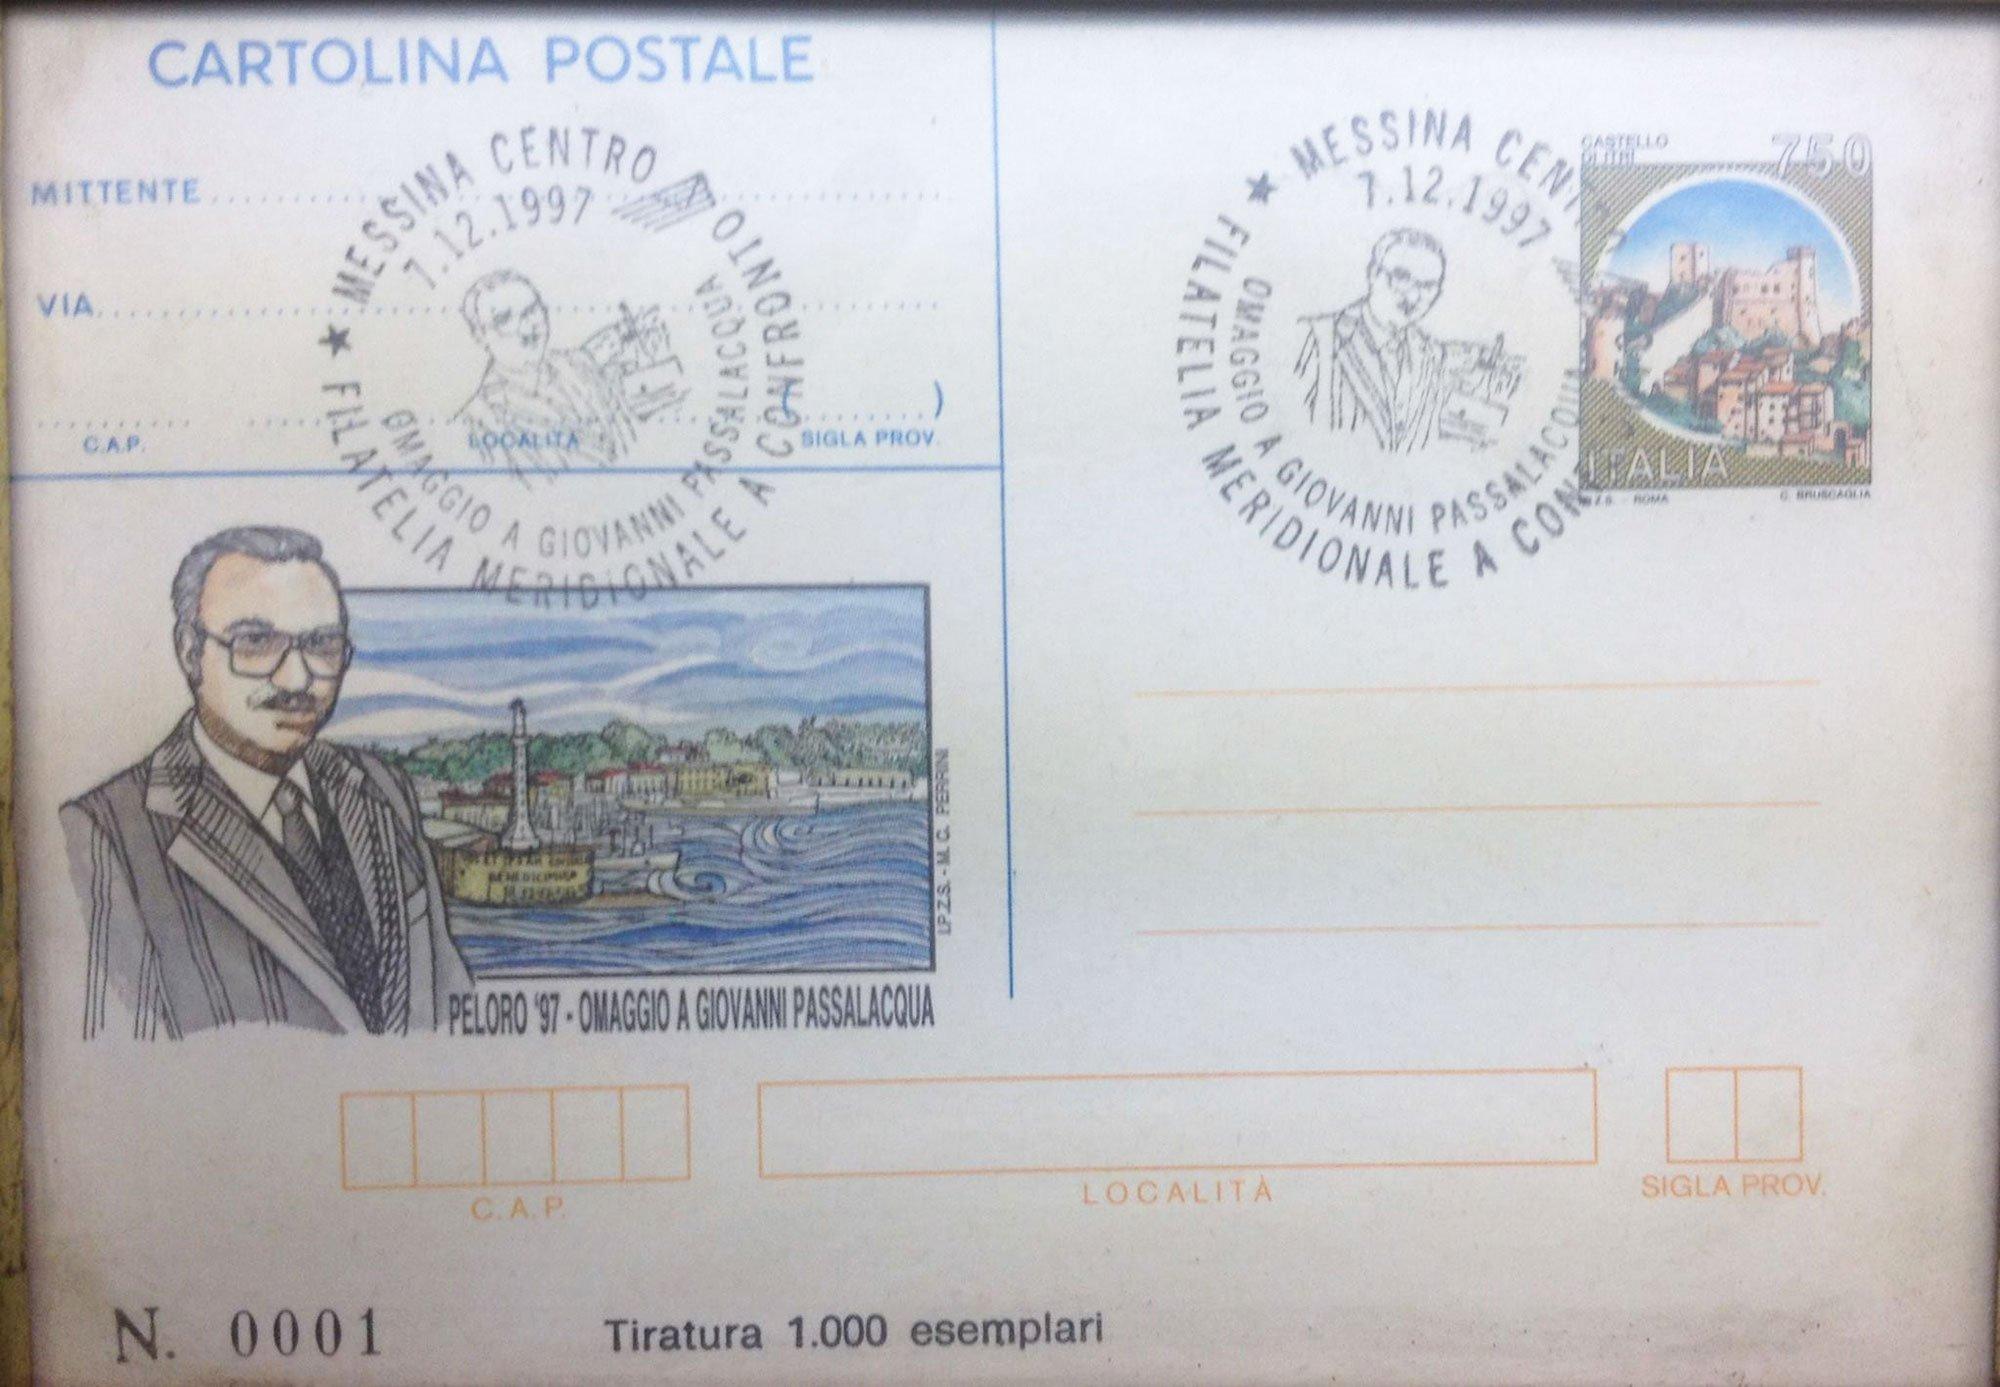 ANTONELLO FILATELIA NUMISMATICA